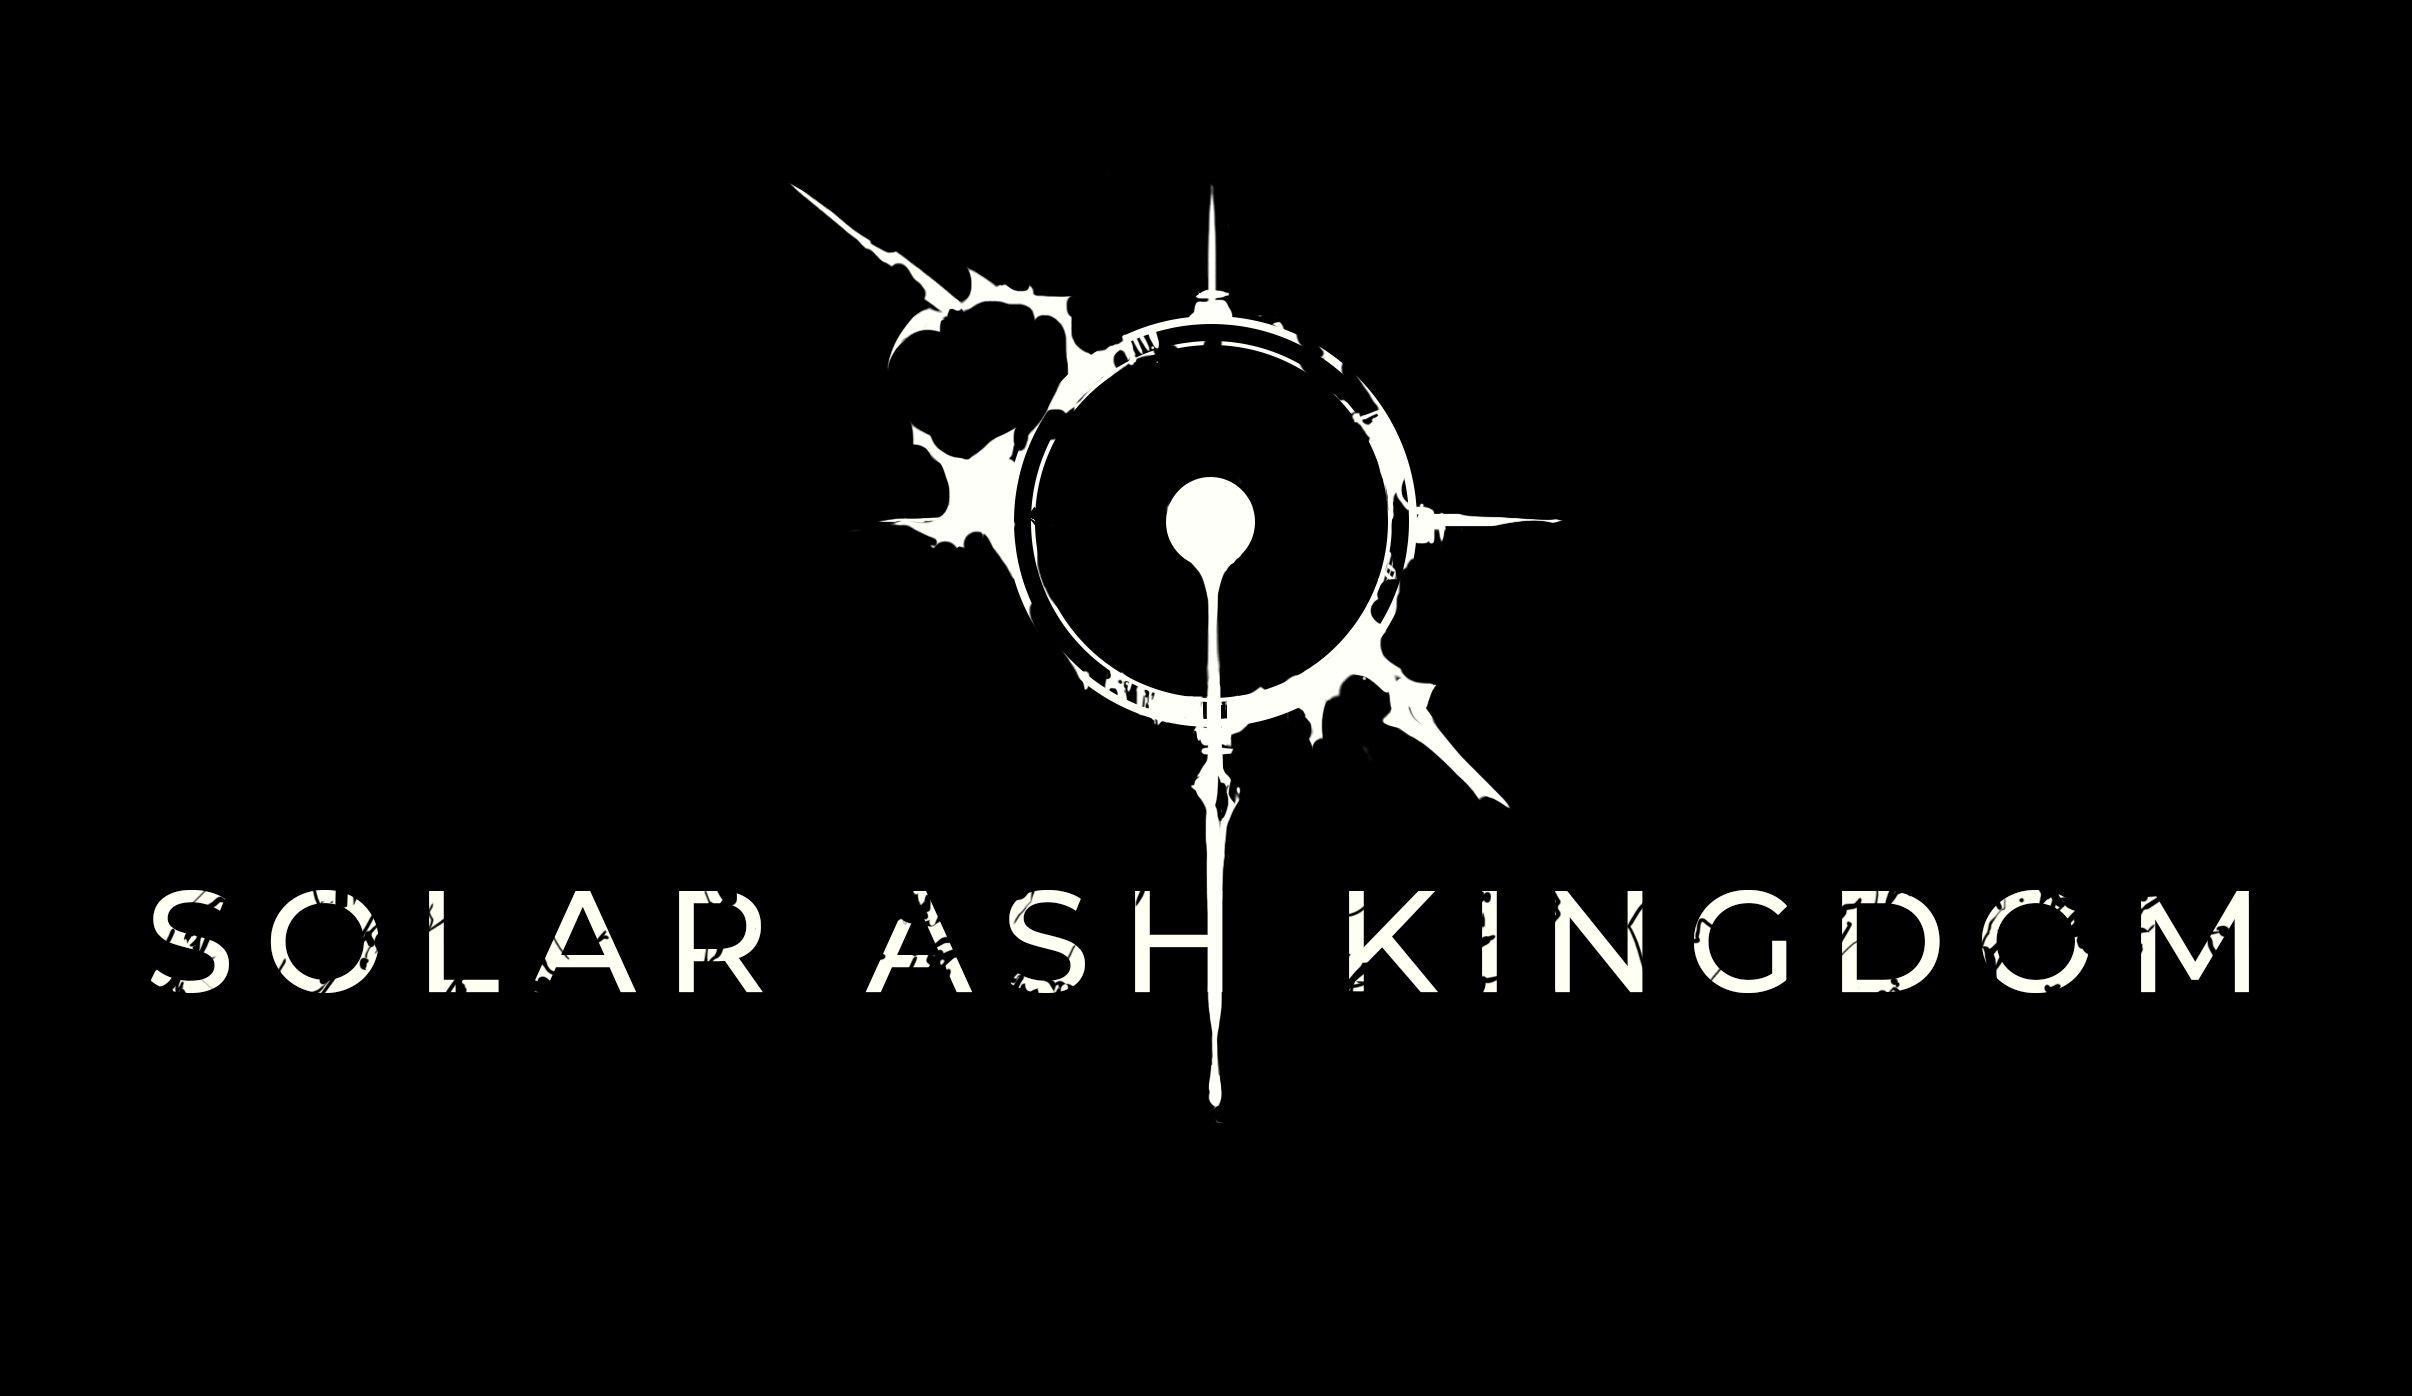 solar ash kingdom logo wallpaper 73231